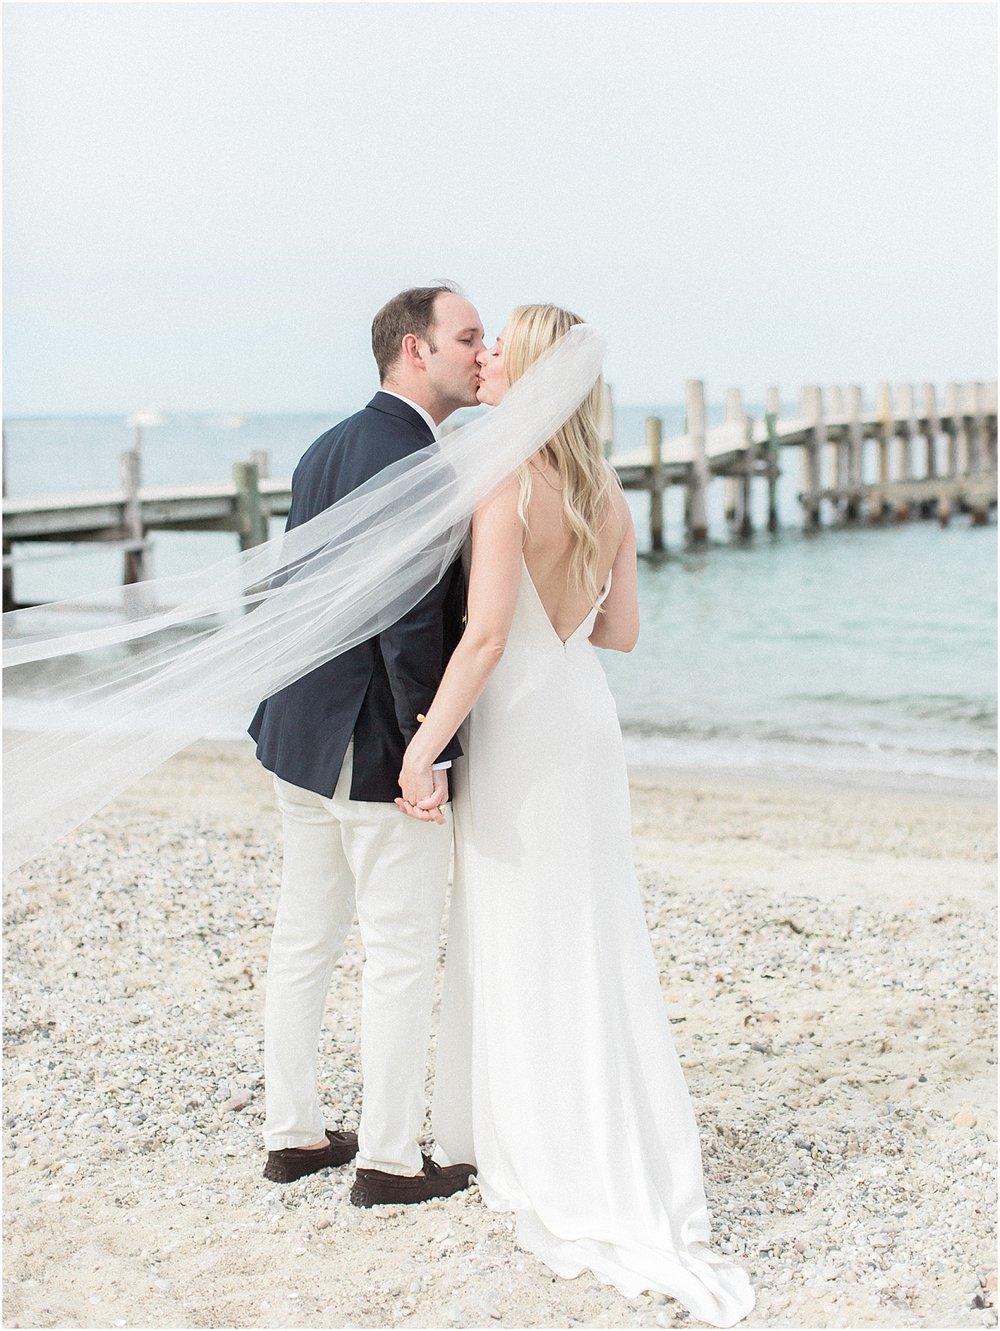 holly_sj_stephen_east_chop_beach_club_marthas_martha_s_vineyard_cape_cod_boston_wedding_photographer_meredith_jane_photography_photo_0246.jpg